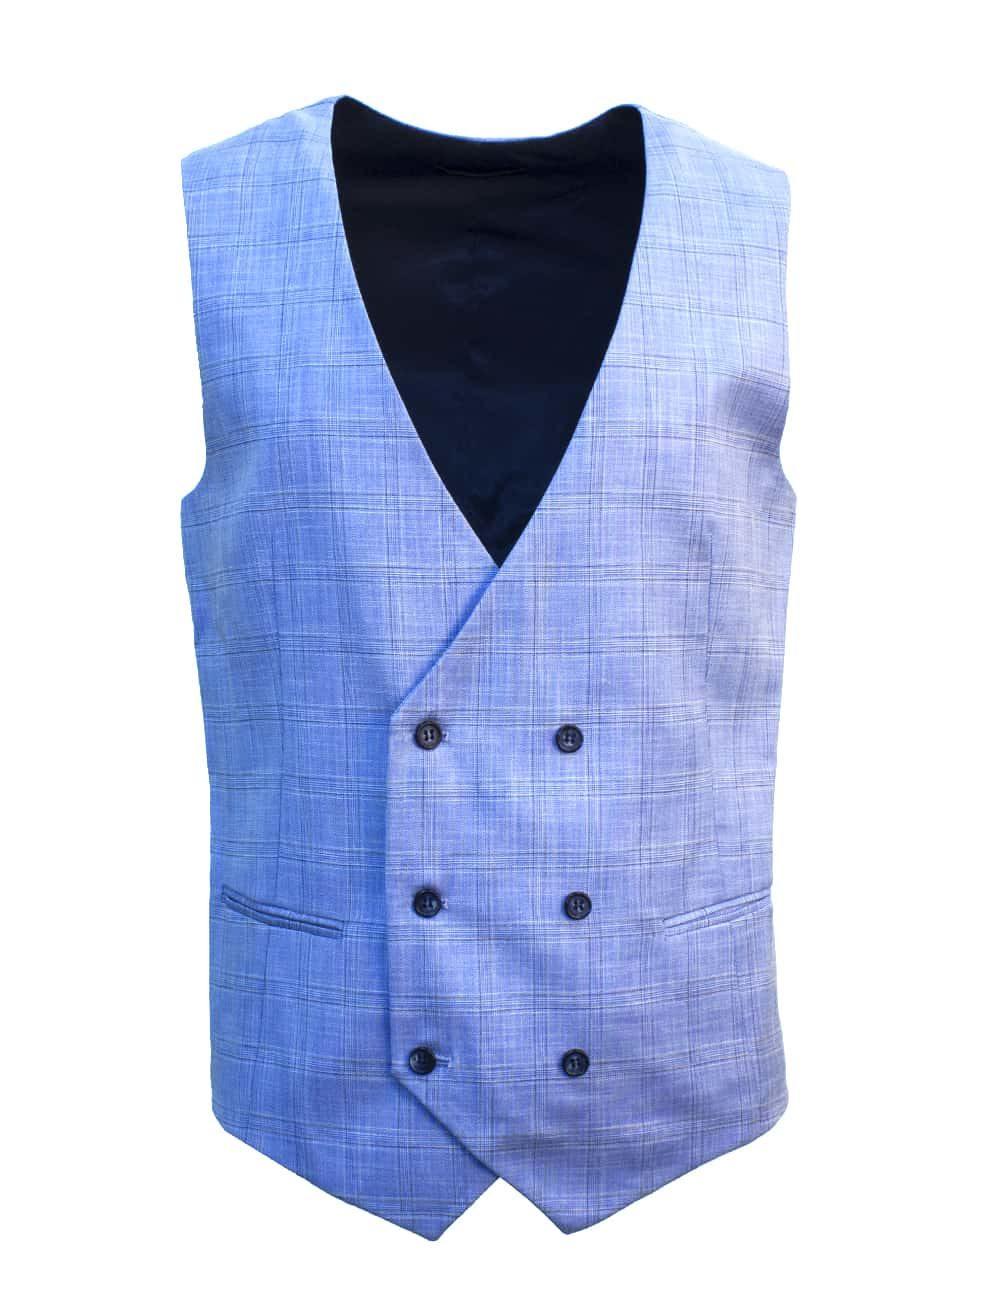 Tailored Fit Sky Blue Checks Double Breasted Vest V2V1.2